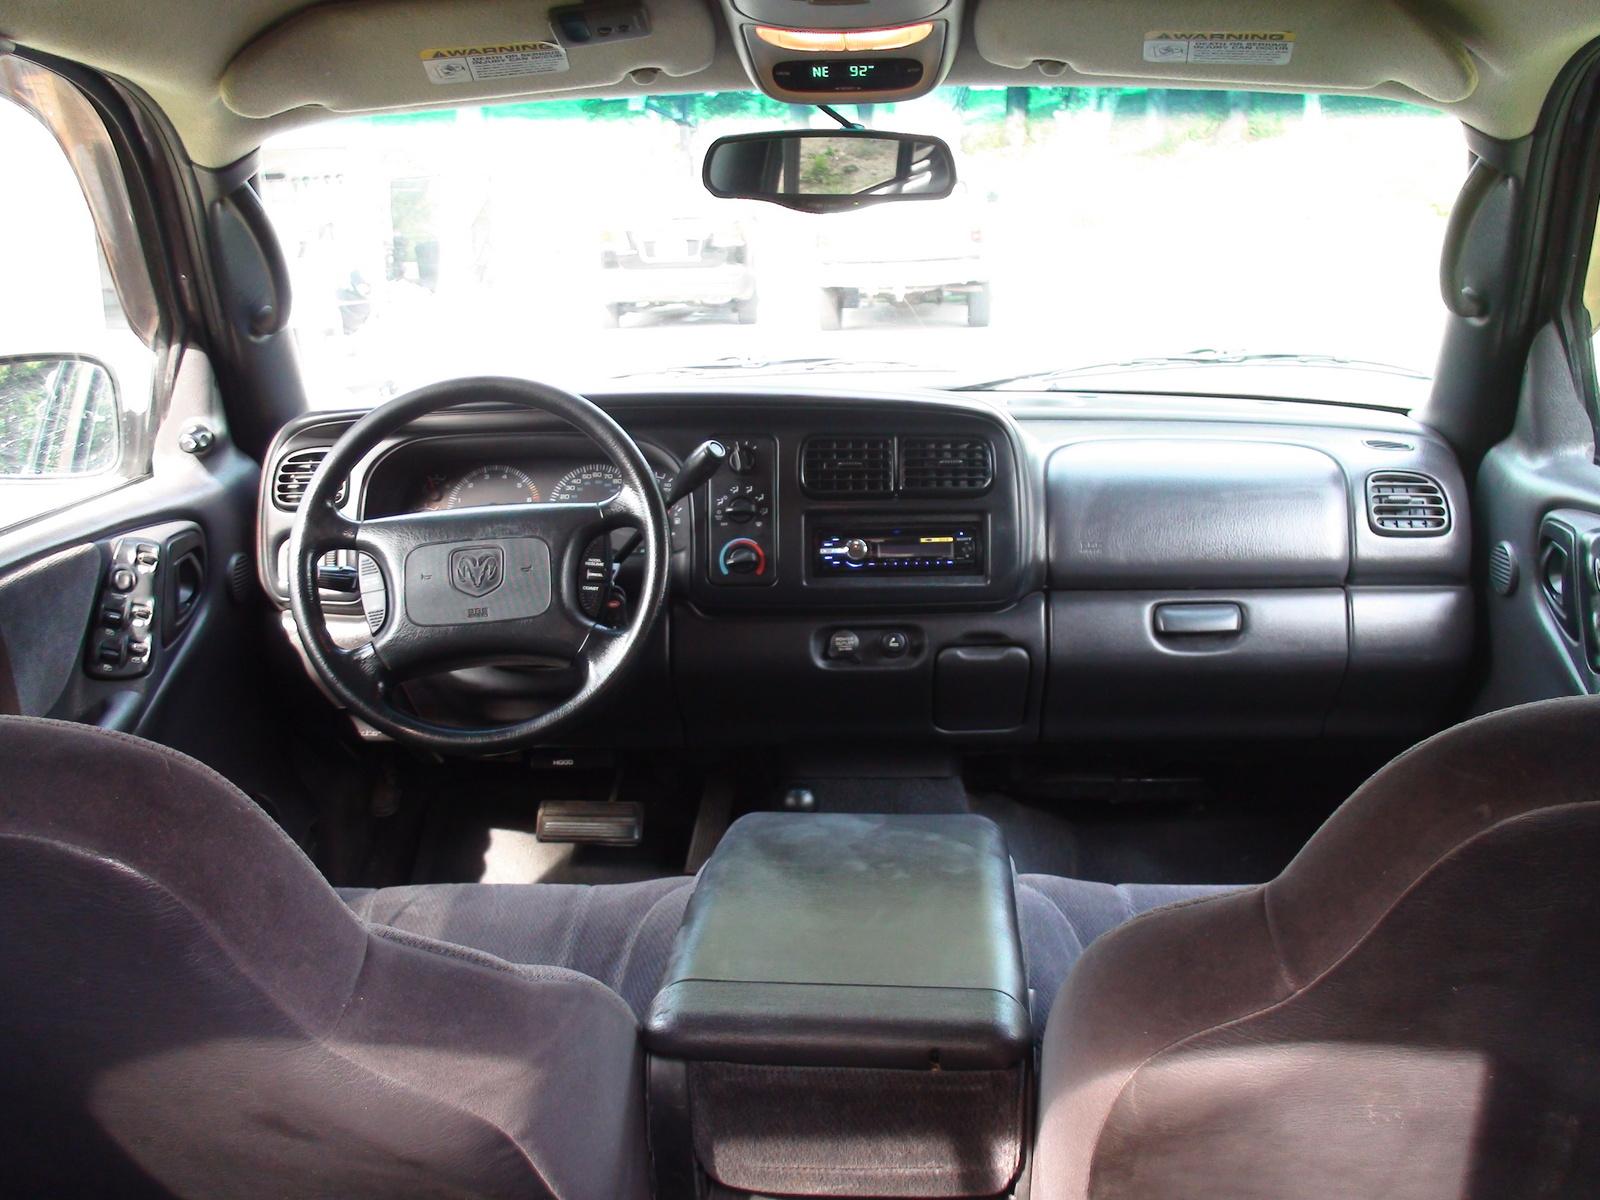 Dodge Dakota Quad Cab Wd Pic on 2000 Dodge Dakota Slt Extended Cab